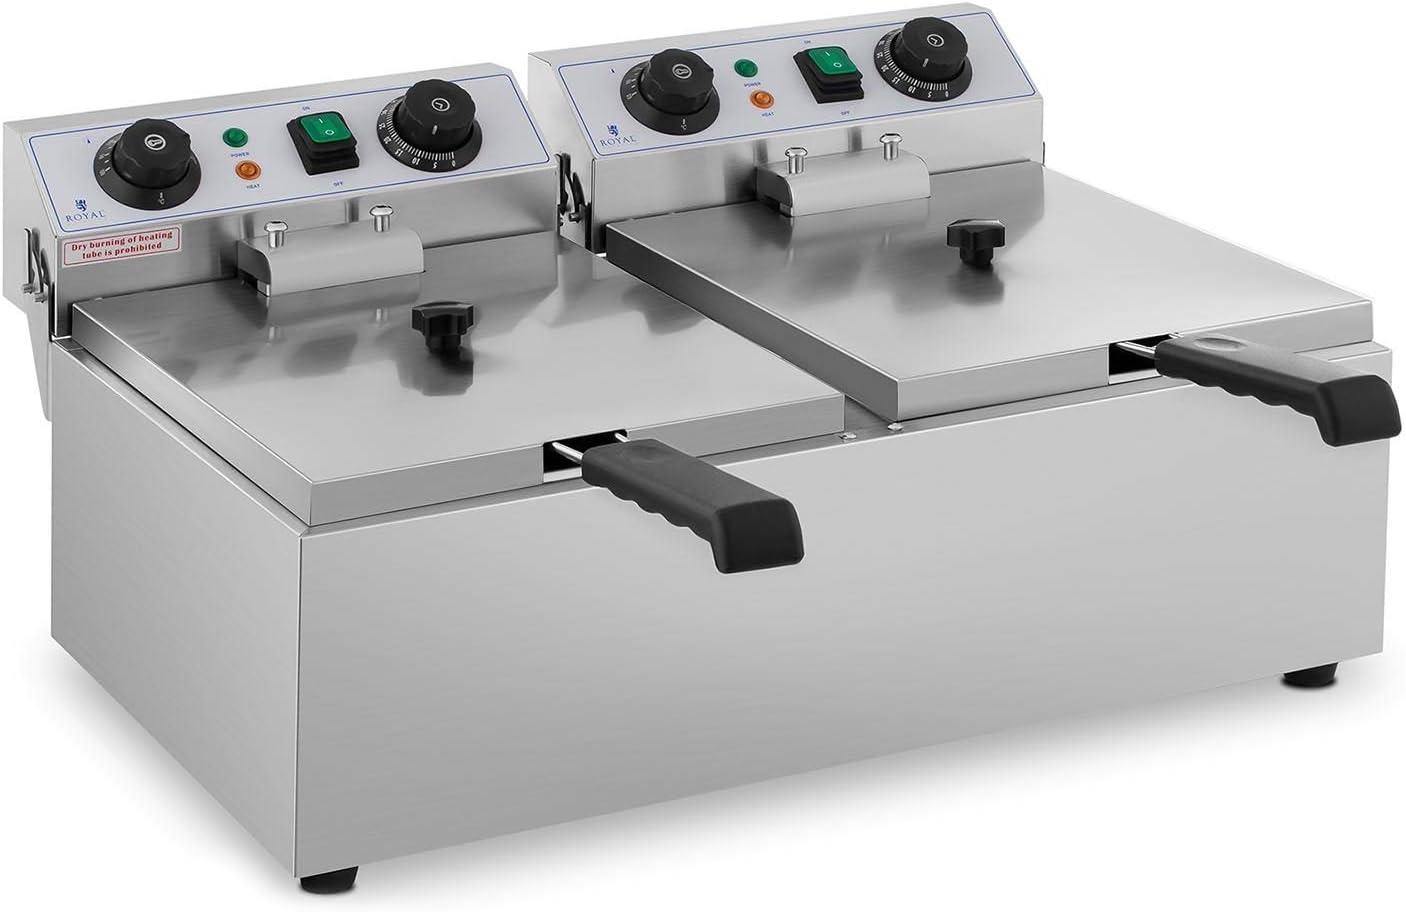 Royal Catering Freidora Eléctrica Doble Para Hostelería 2 x 10 Litros 230 V RCTF 10DB (2 x 3.200 W, Temporizador 60 Min, Temperatura: 50-200 °C)